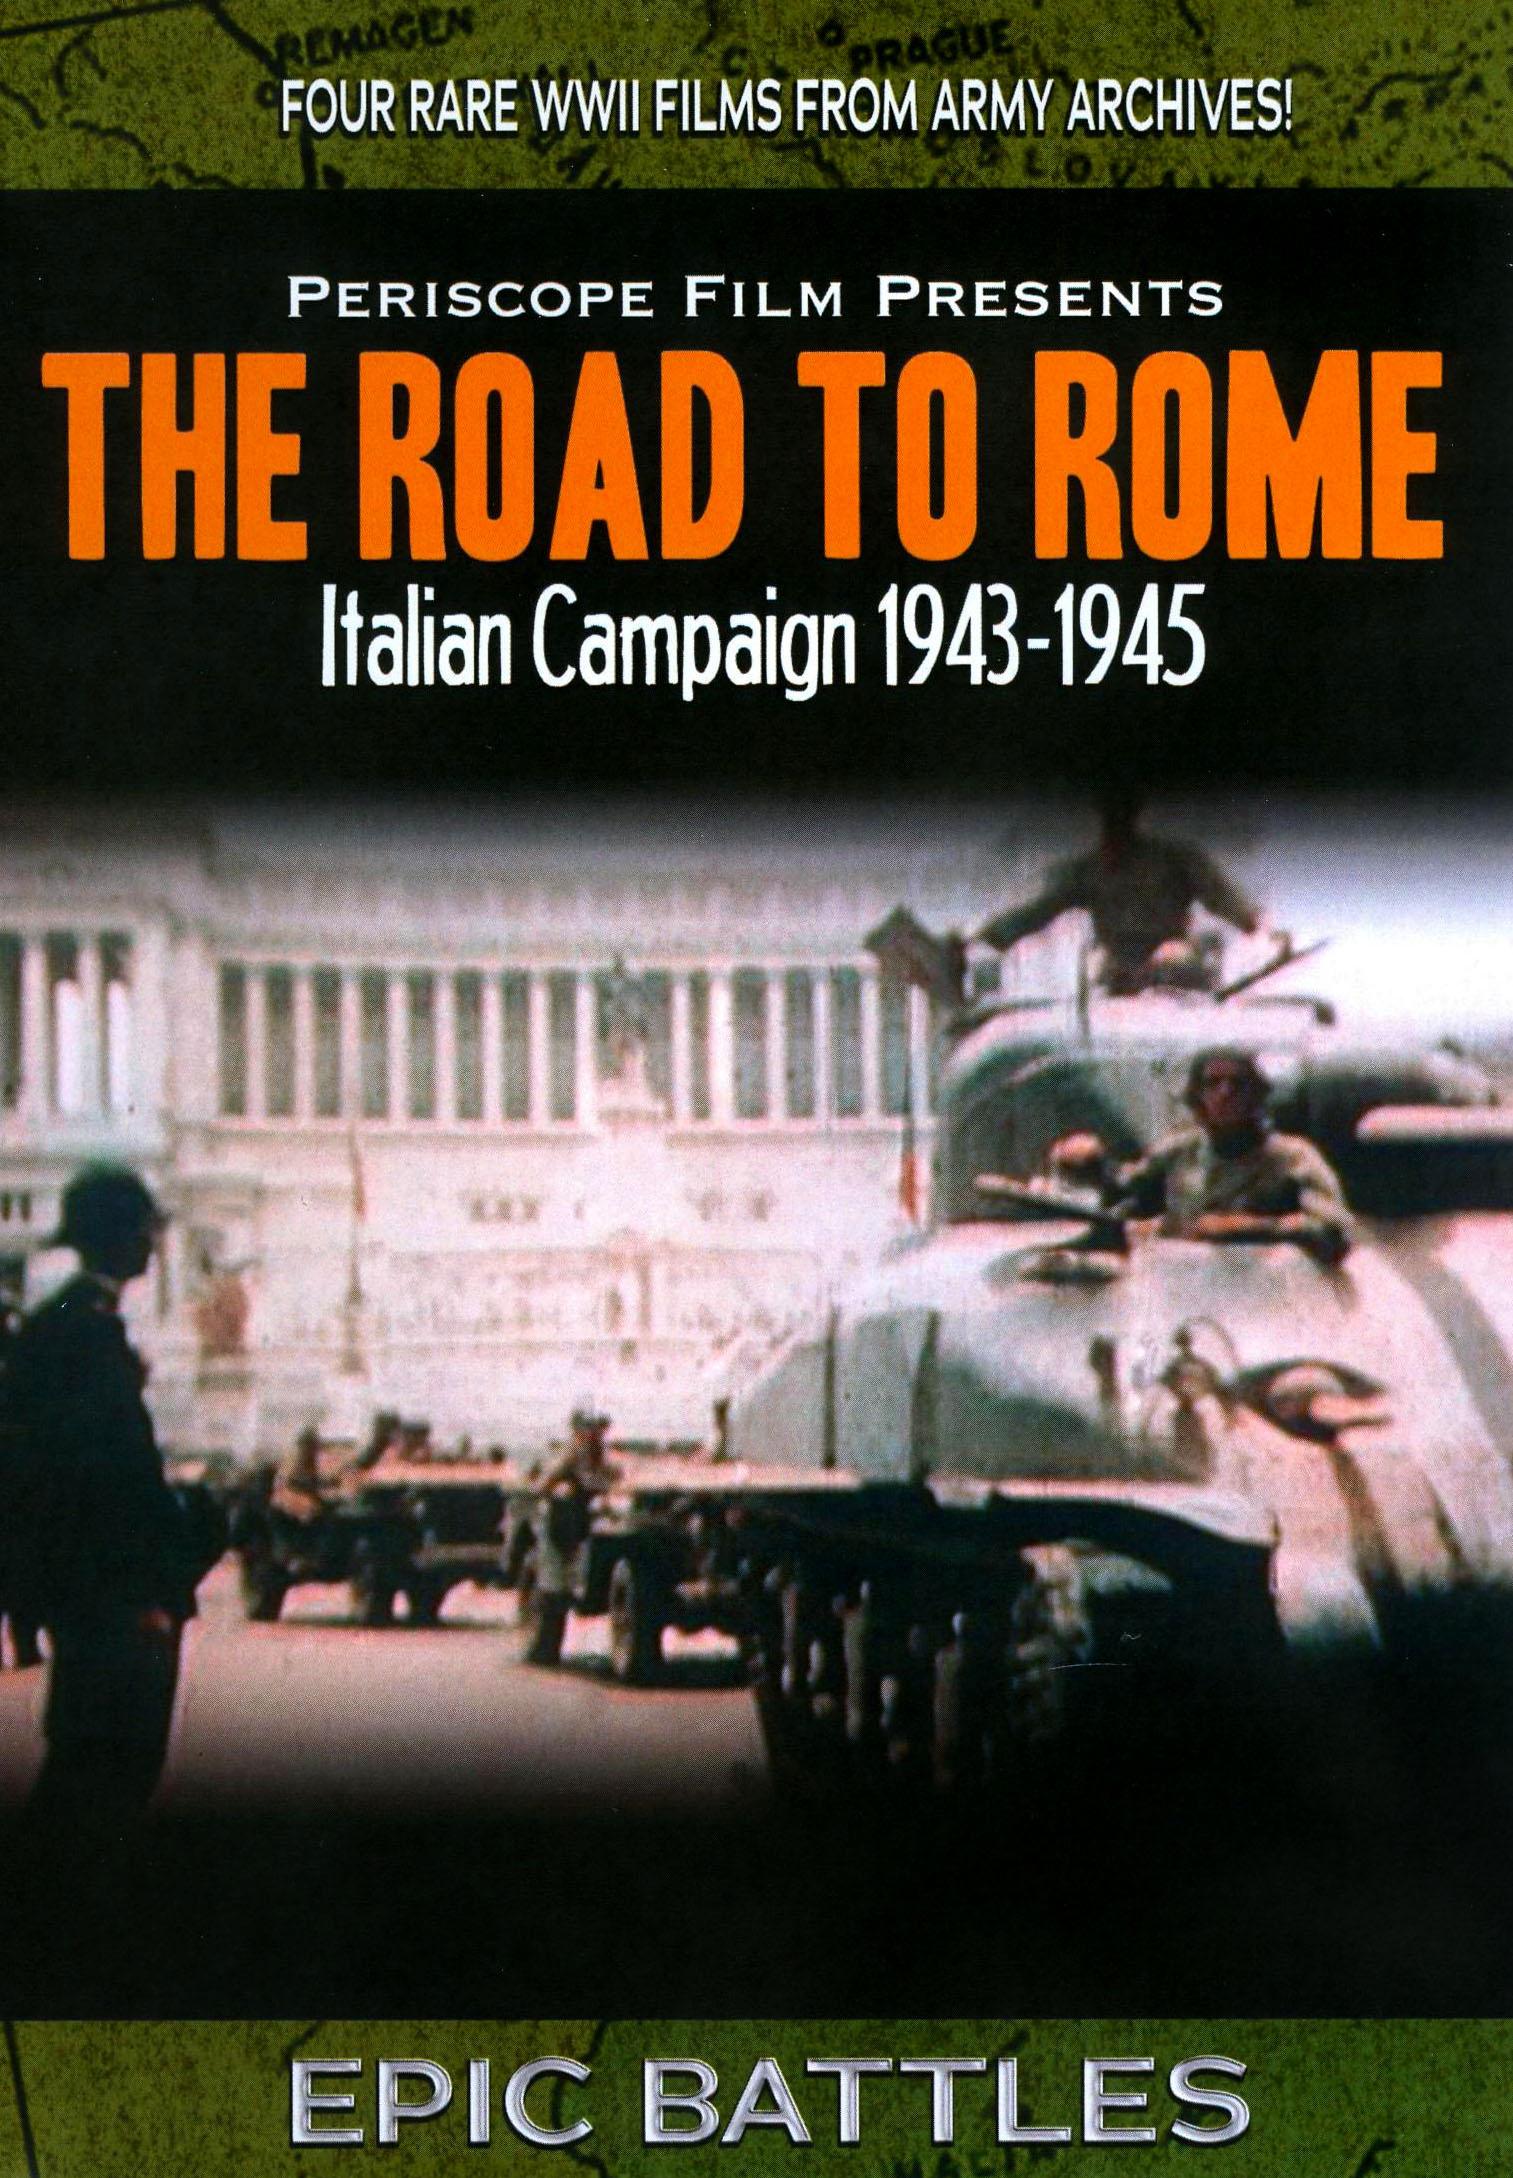 Road to Rome: Italian Campaign 1943-1945